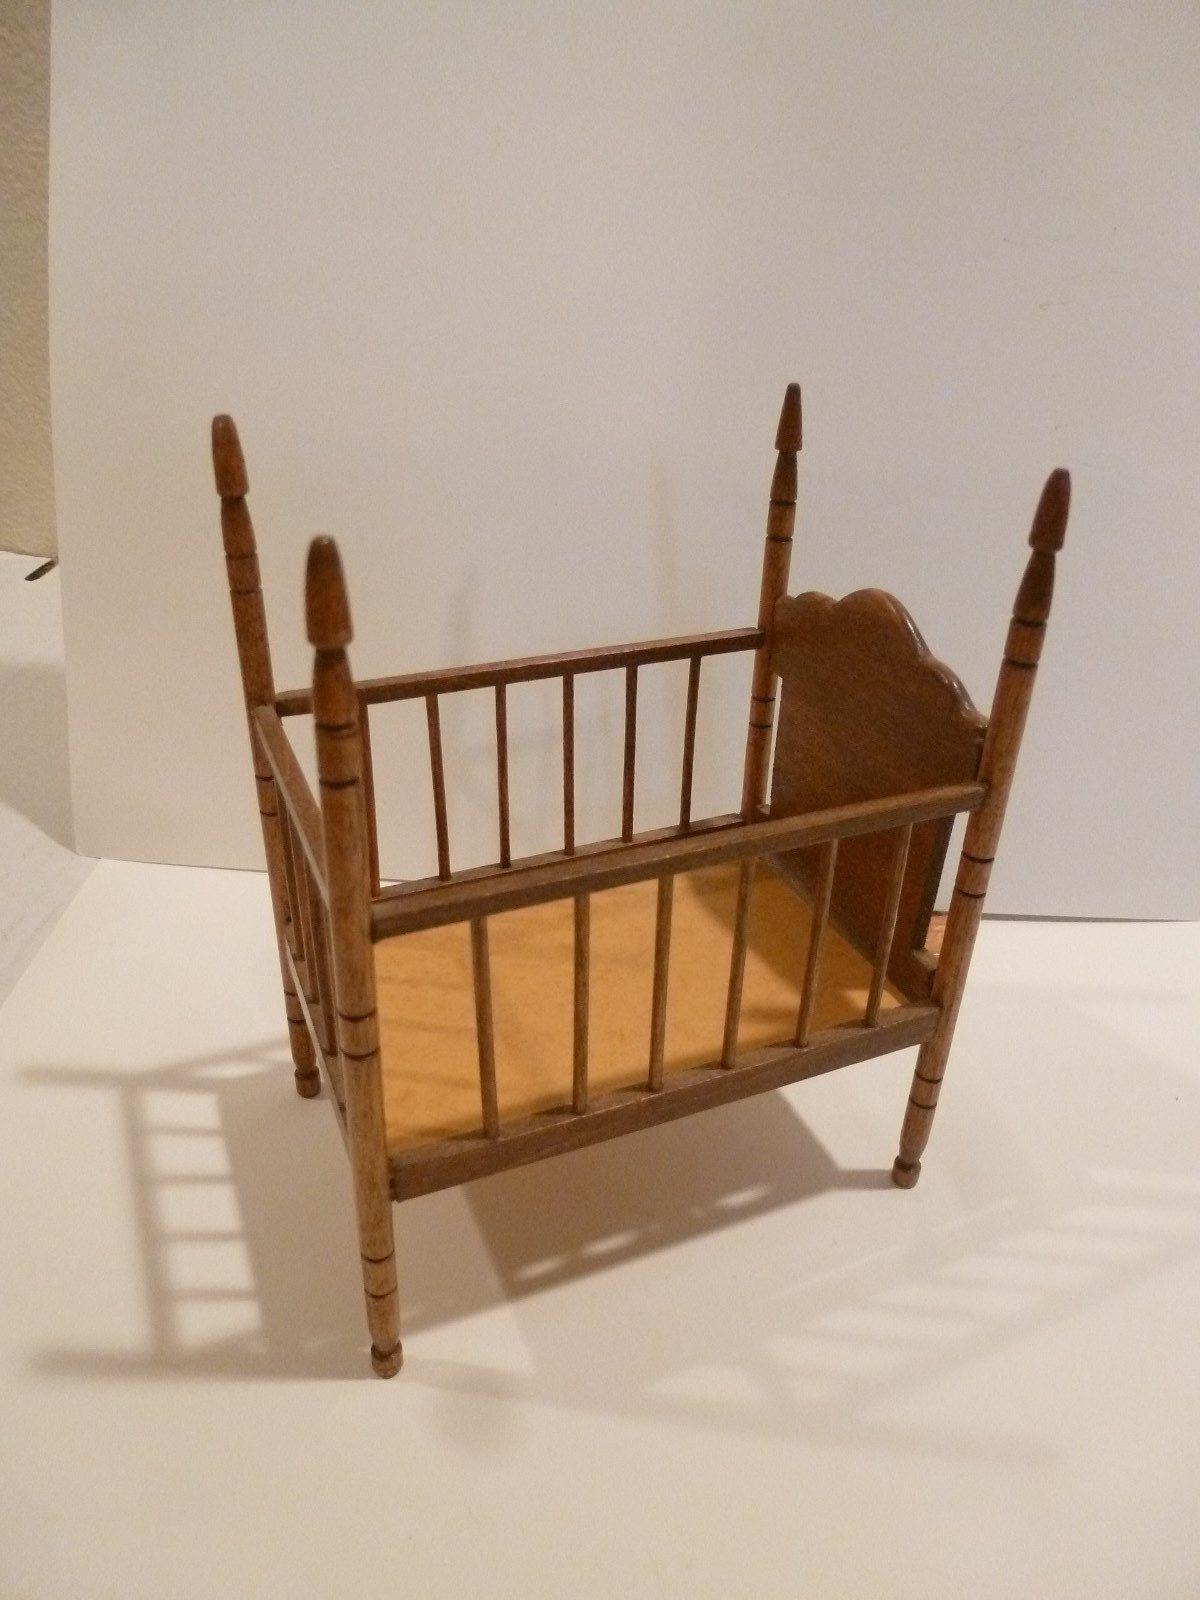 Beautiful Miniature Handmade Wood Baby Crib Signed Greg H ...